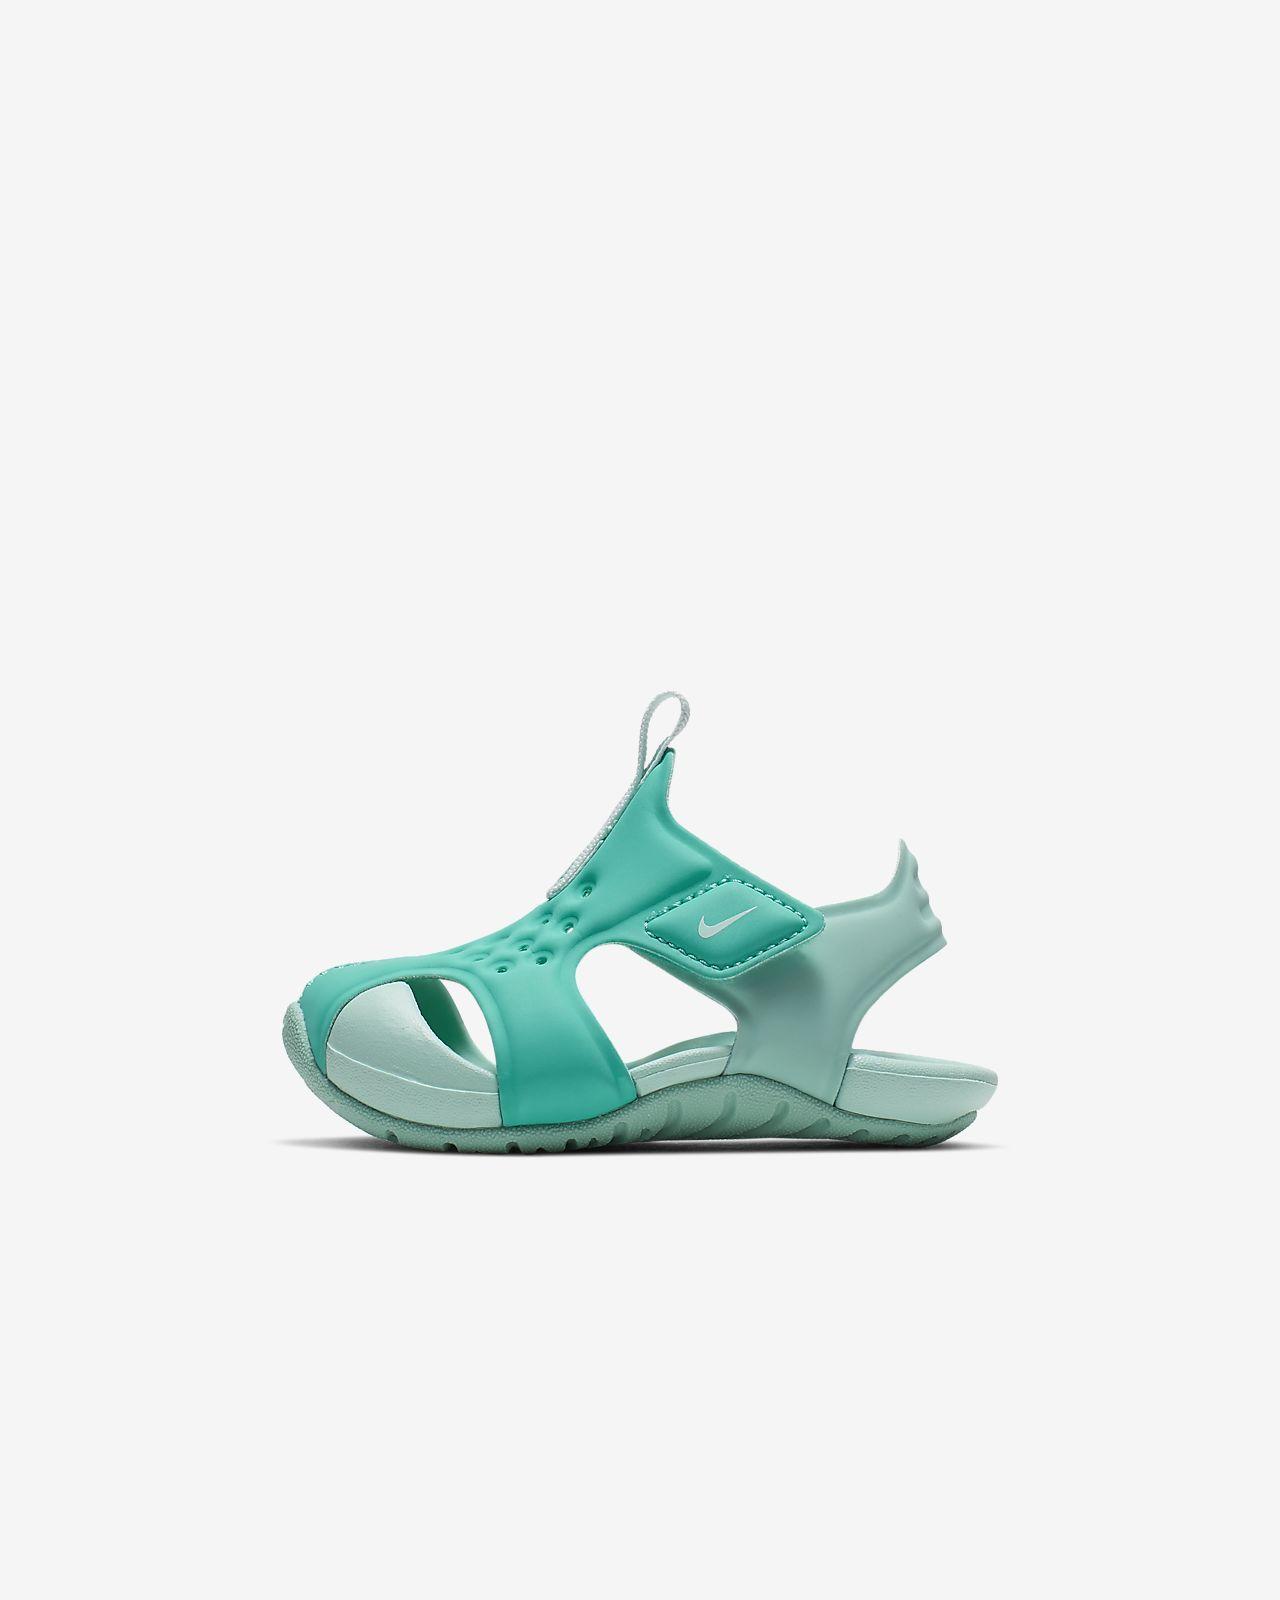 Nike Sunray Protect 2 Infant/Toddler Sandal